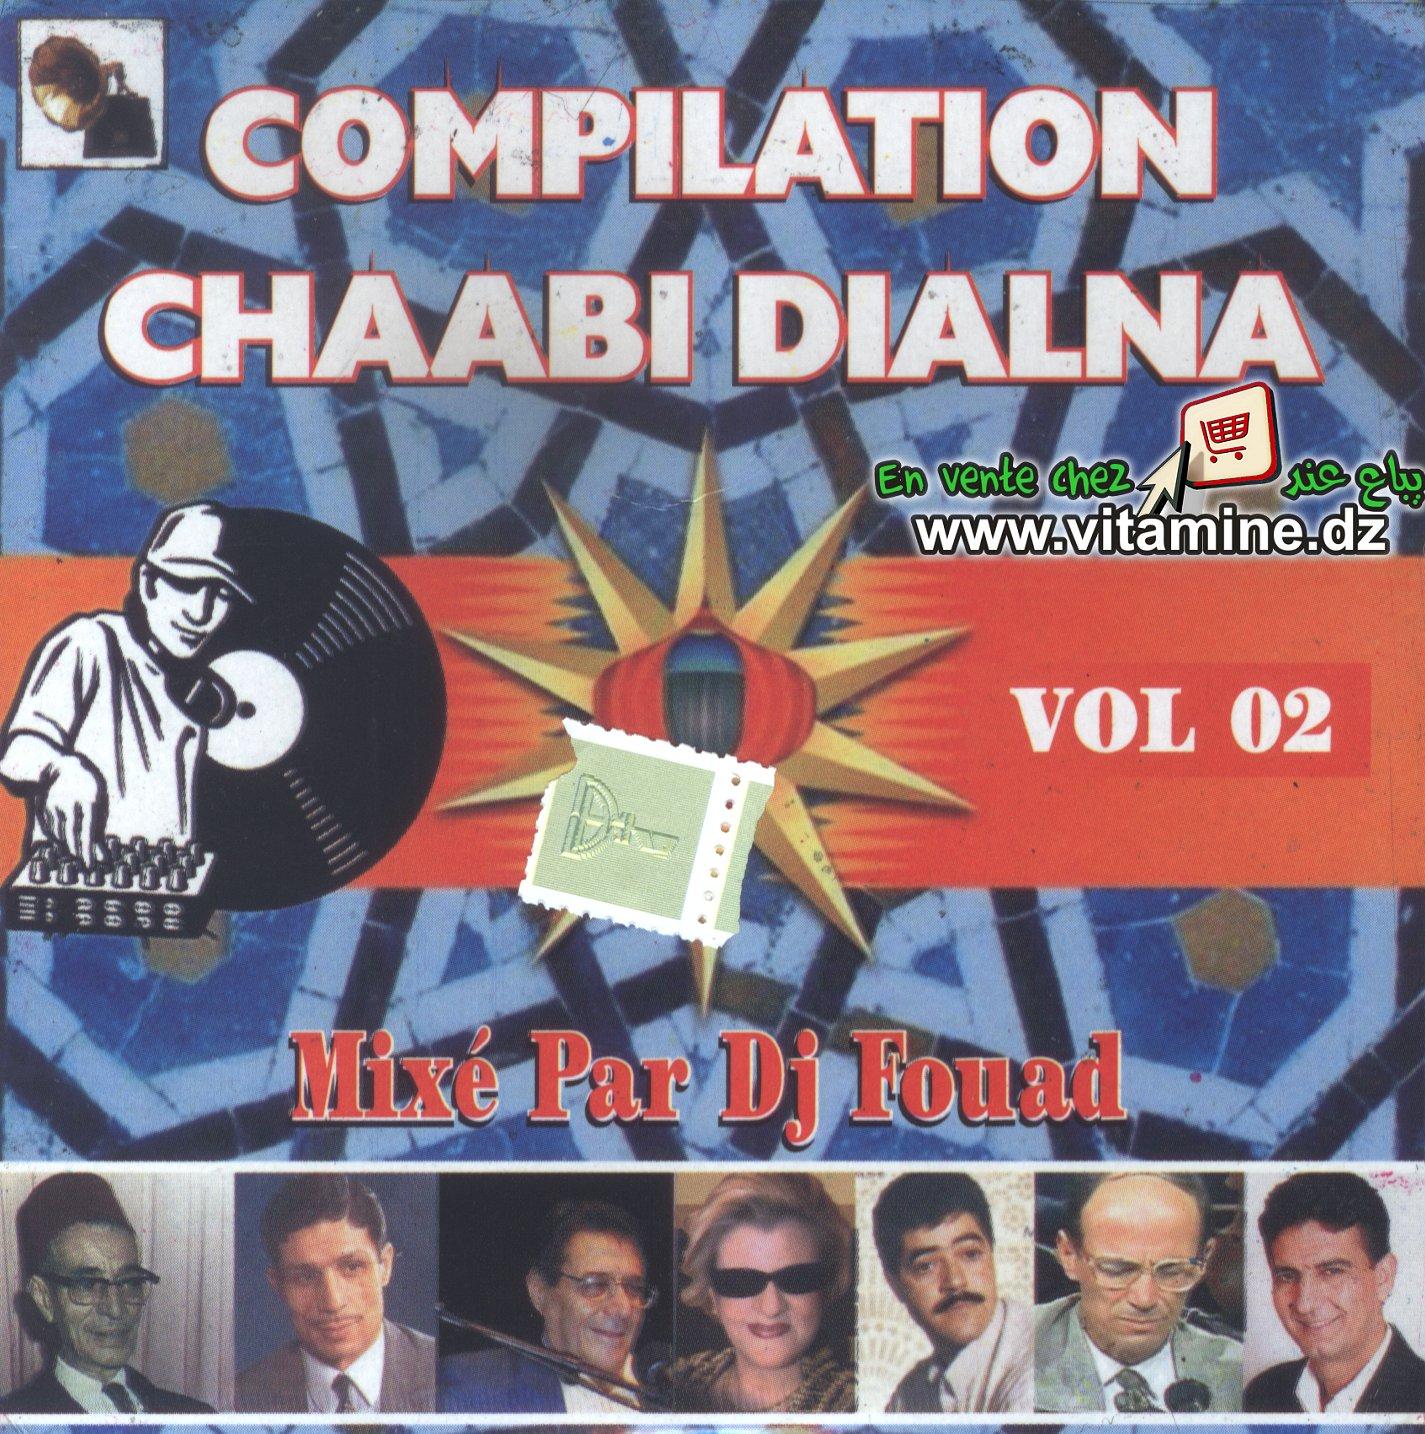 Compilation Chaâbi Dialna